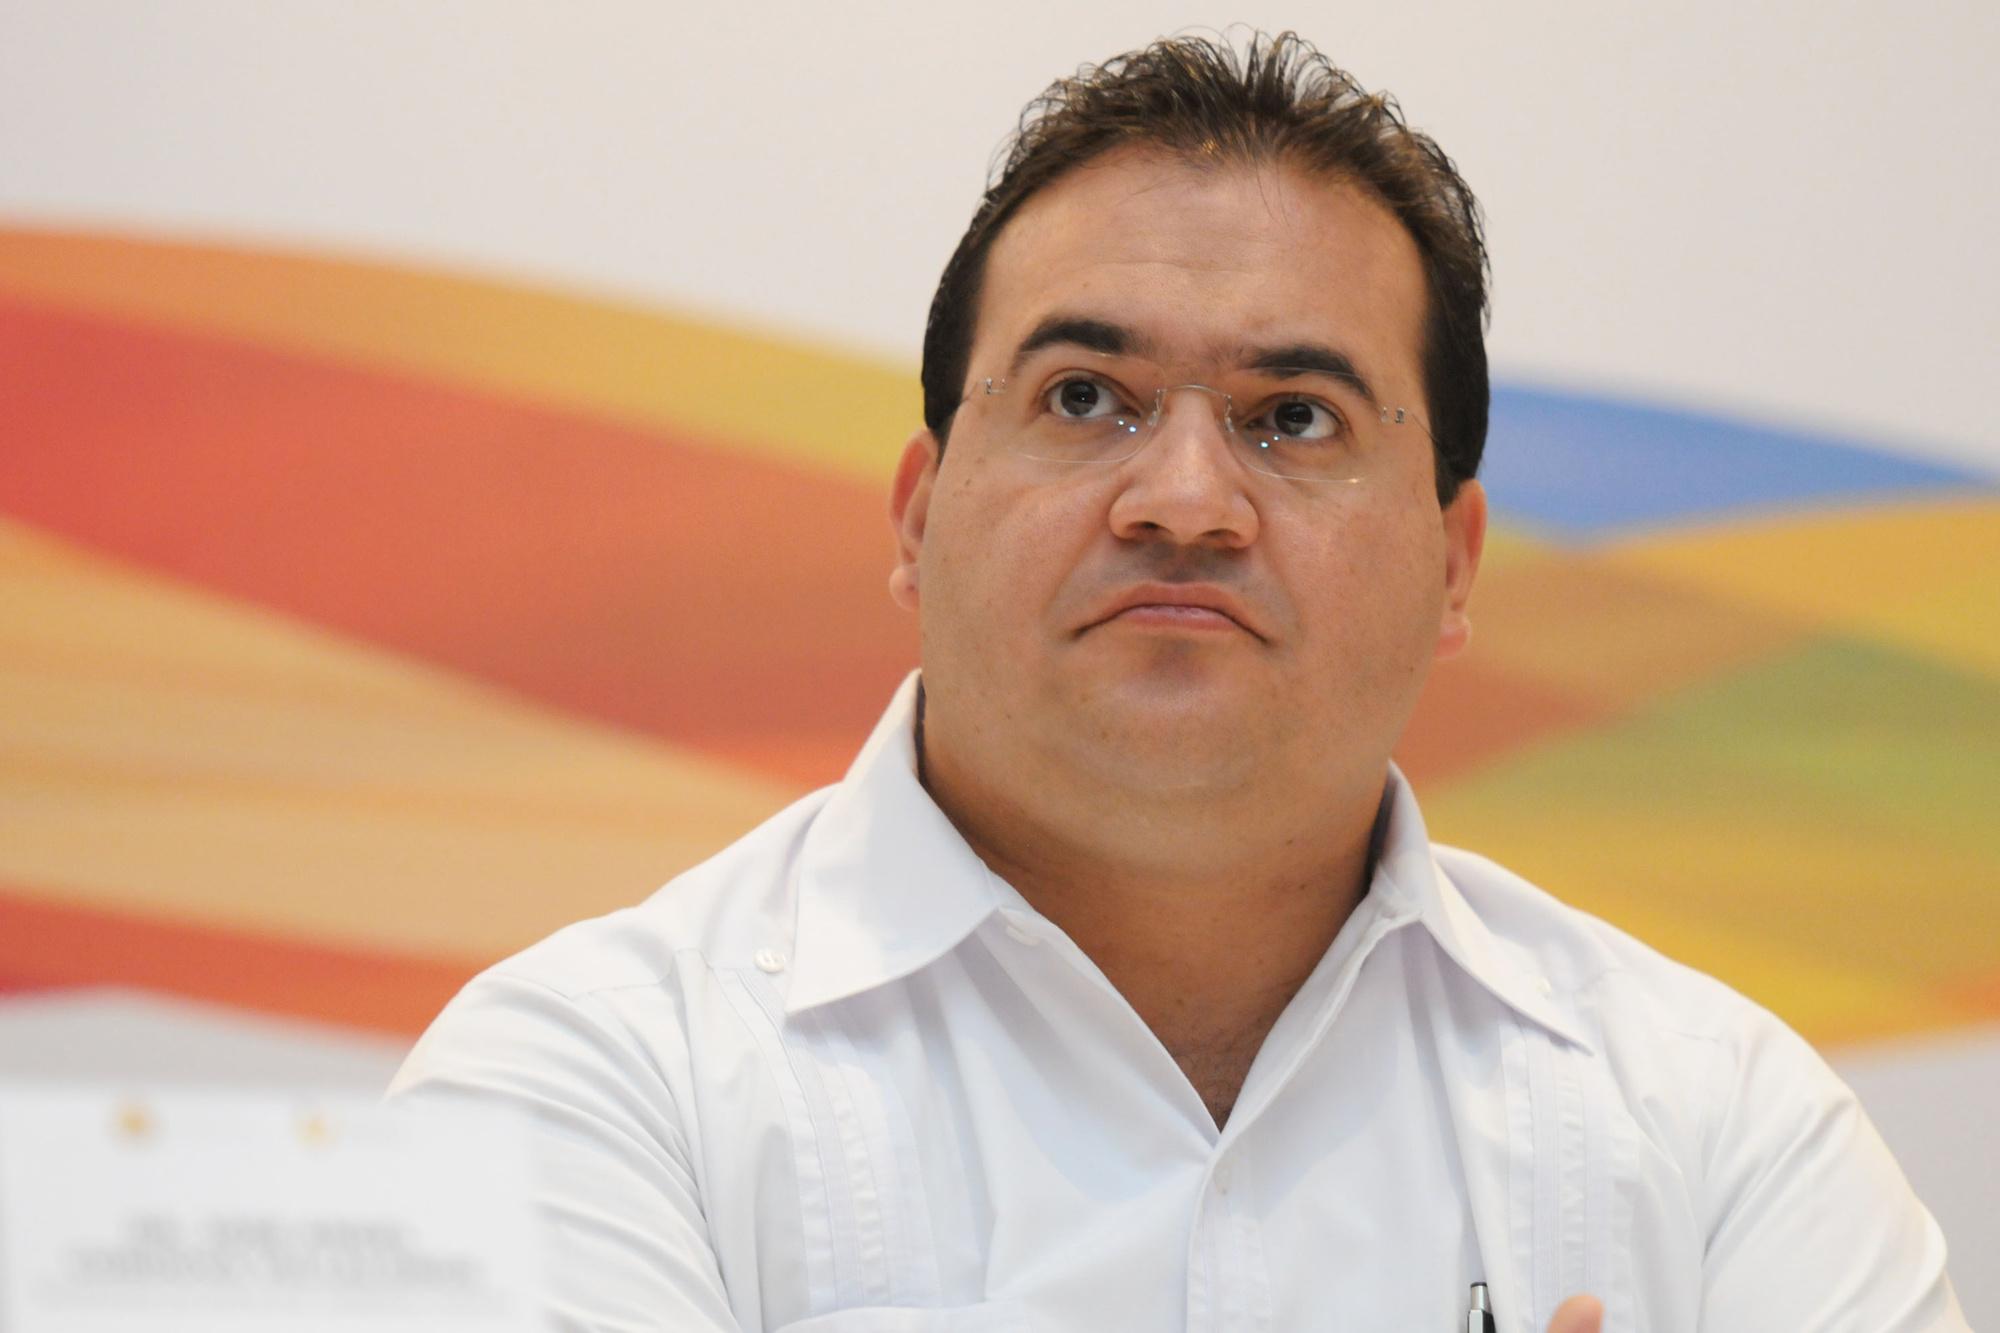 Javier Duarte, voormalig gouverneur van Veracruz., Proceso